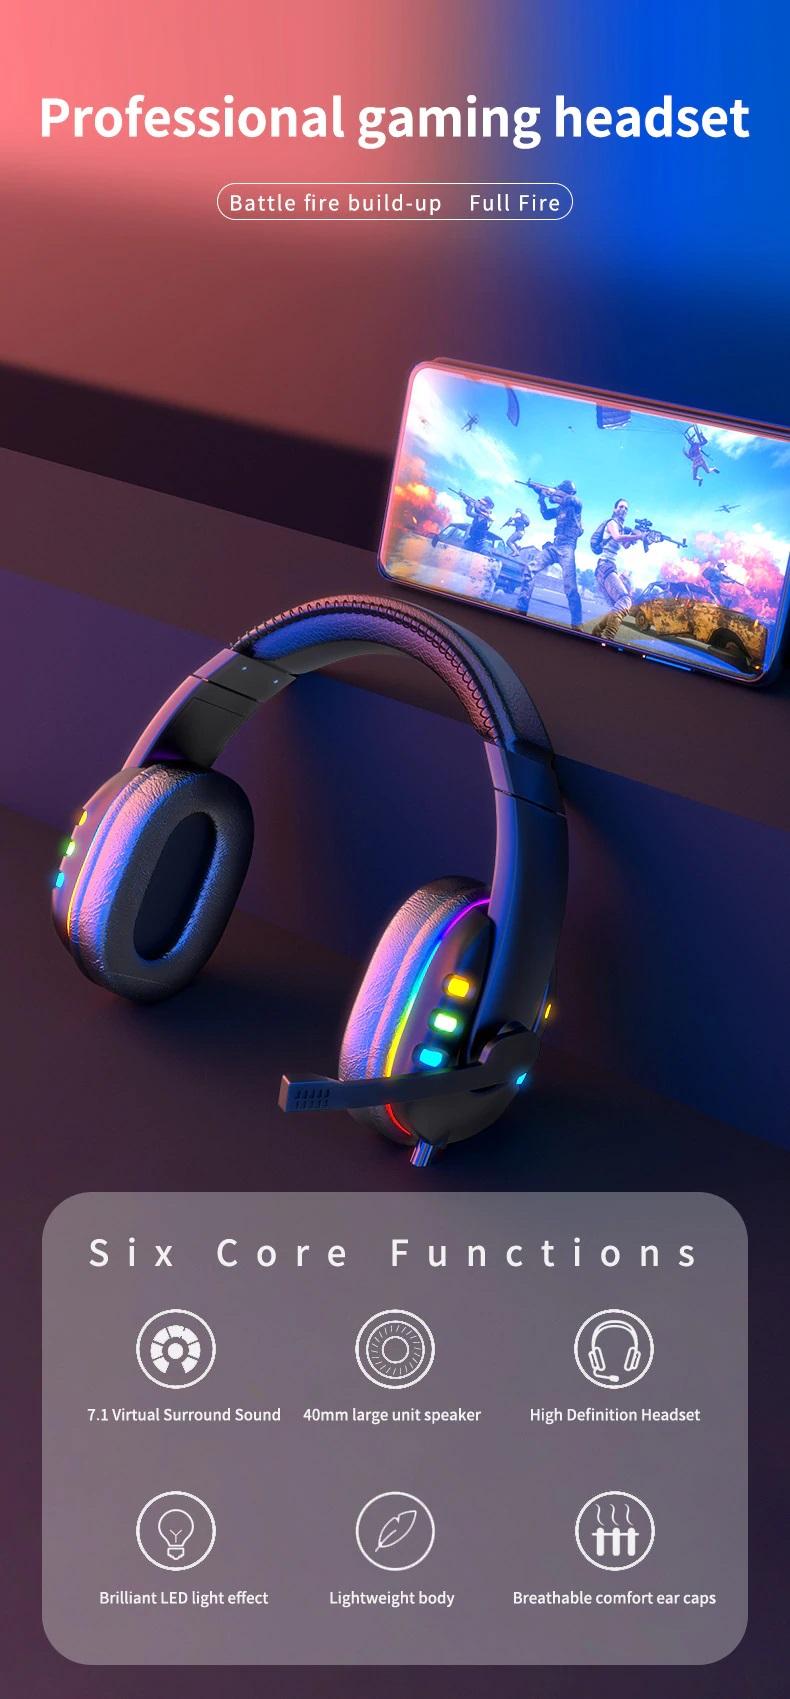 OGG Pro gaming headset